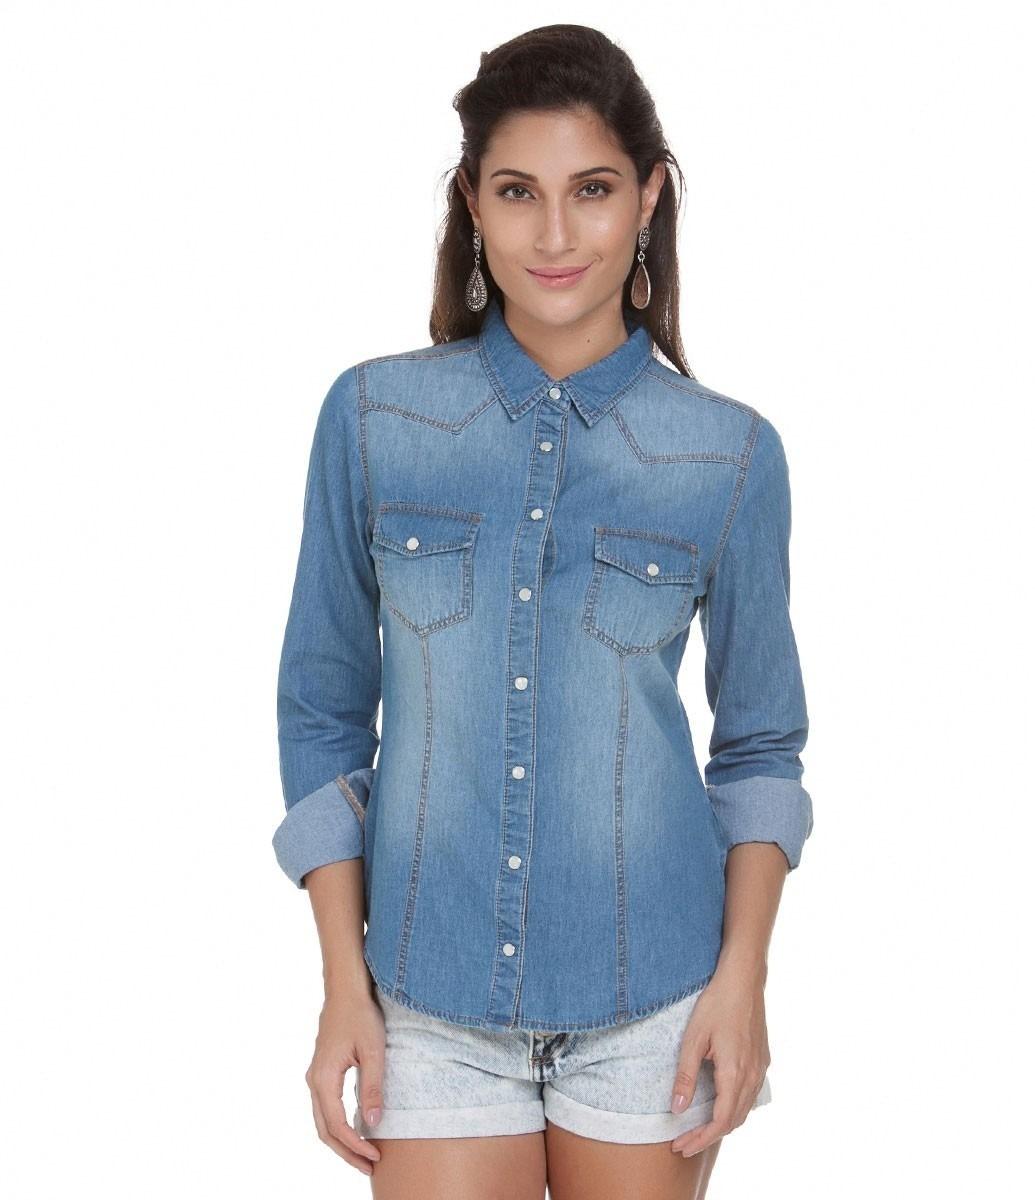 1d53970ece camisa blusa jeans feminina manga longa - pronta entrega. Carregando zoom.